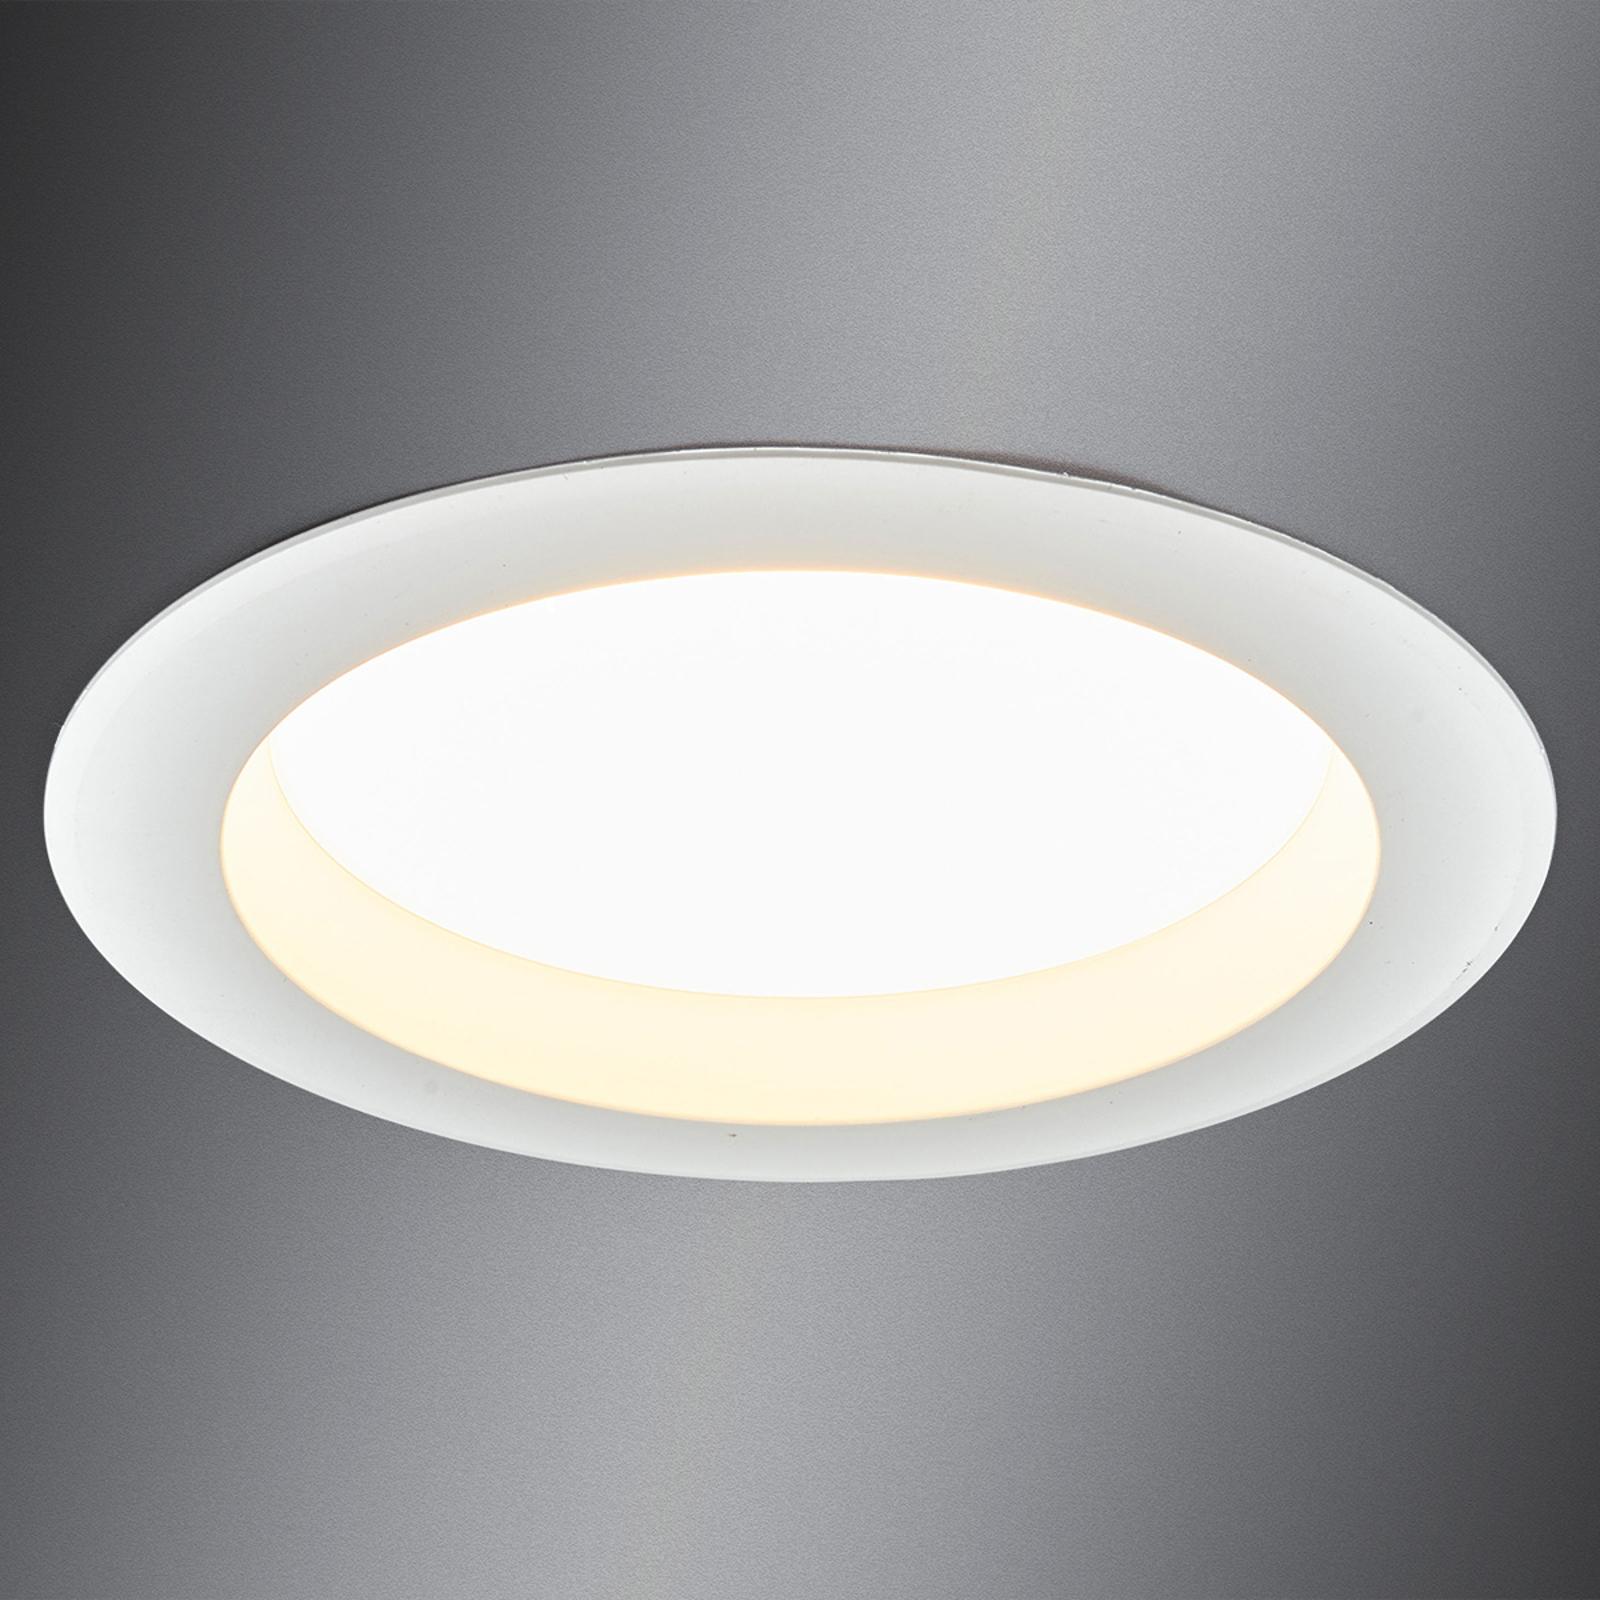 Hell leuchtendes LED-Downlight Arian, 17,4 cm 15W